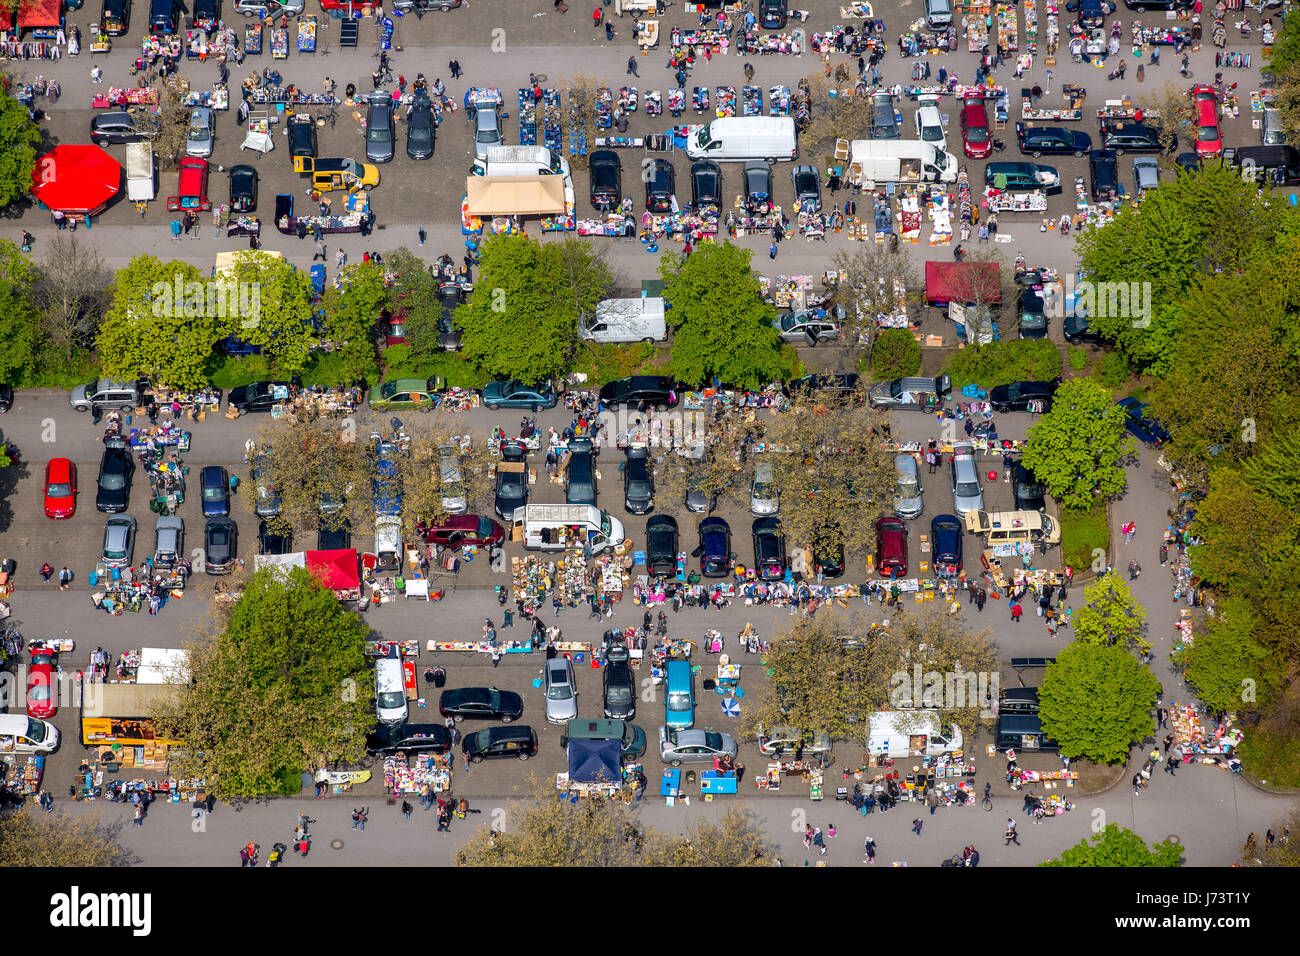 Flea Market at the University of Dortmund, bargain market, secondhand market, Dortmund, Ruhr area, North Rhine-Westphalia, - Stock Image